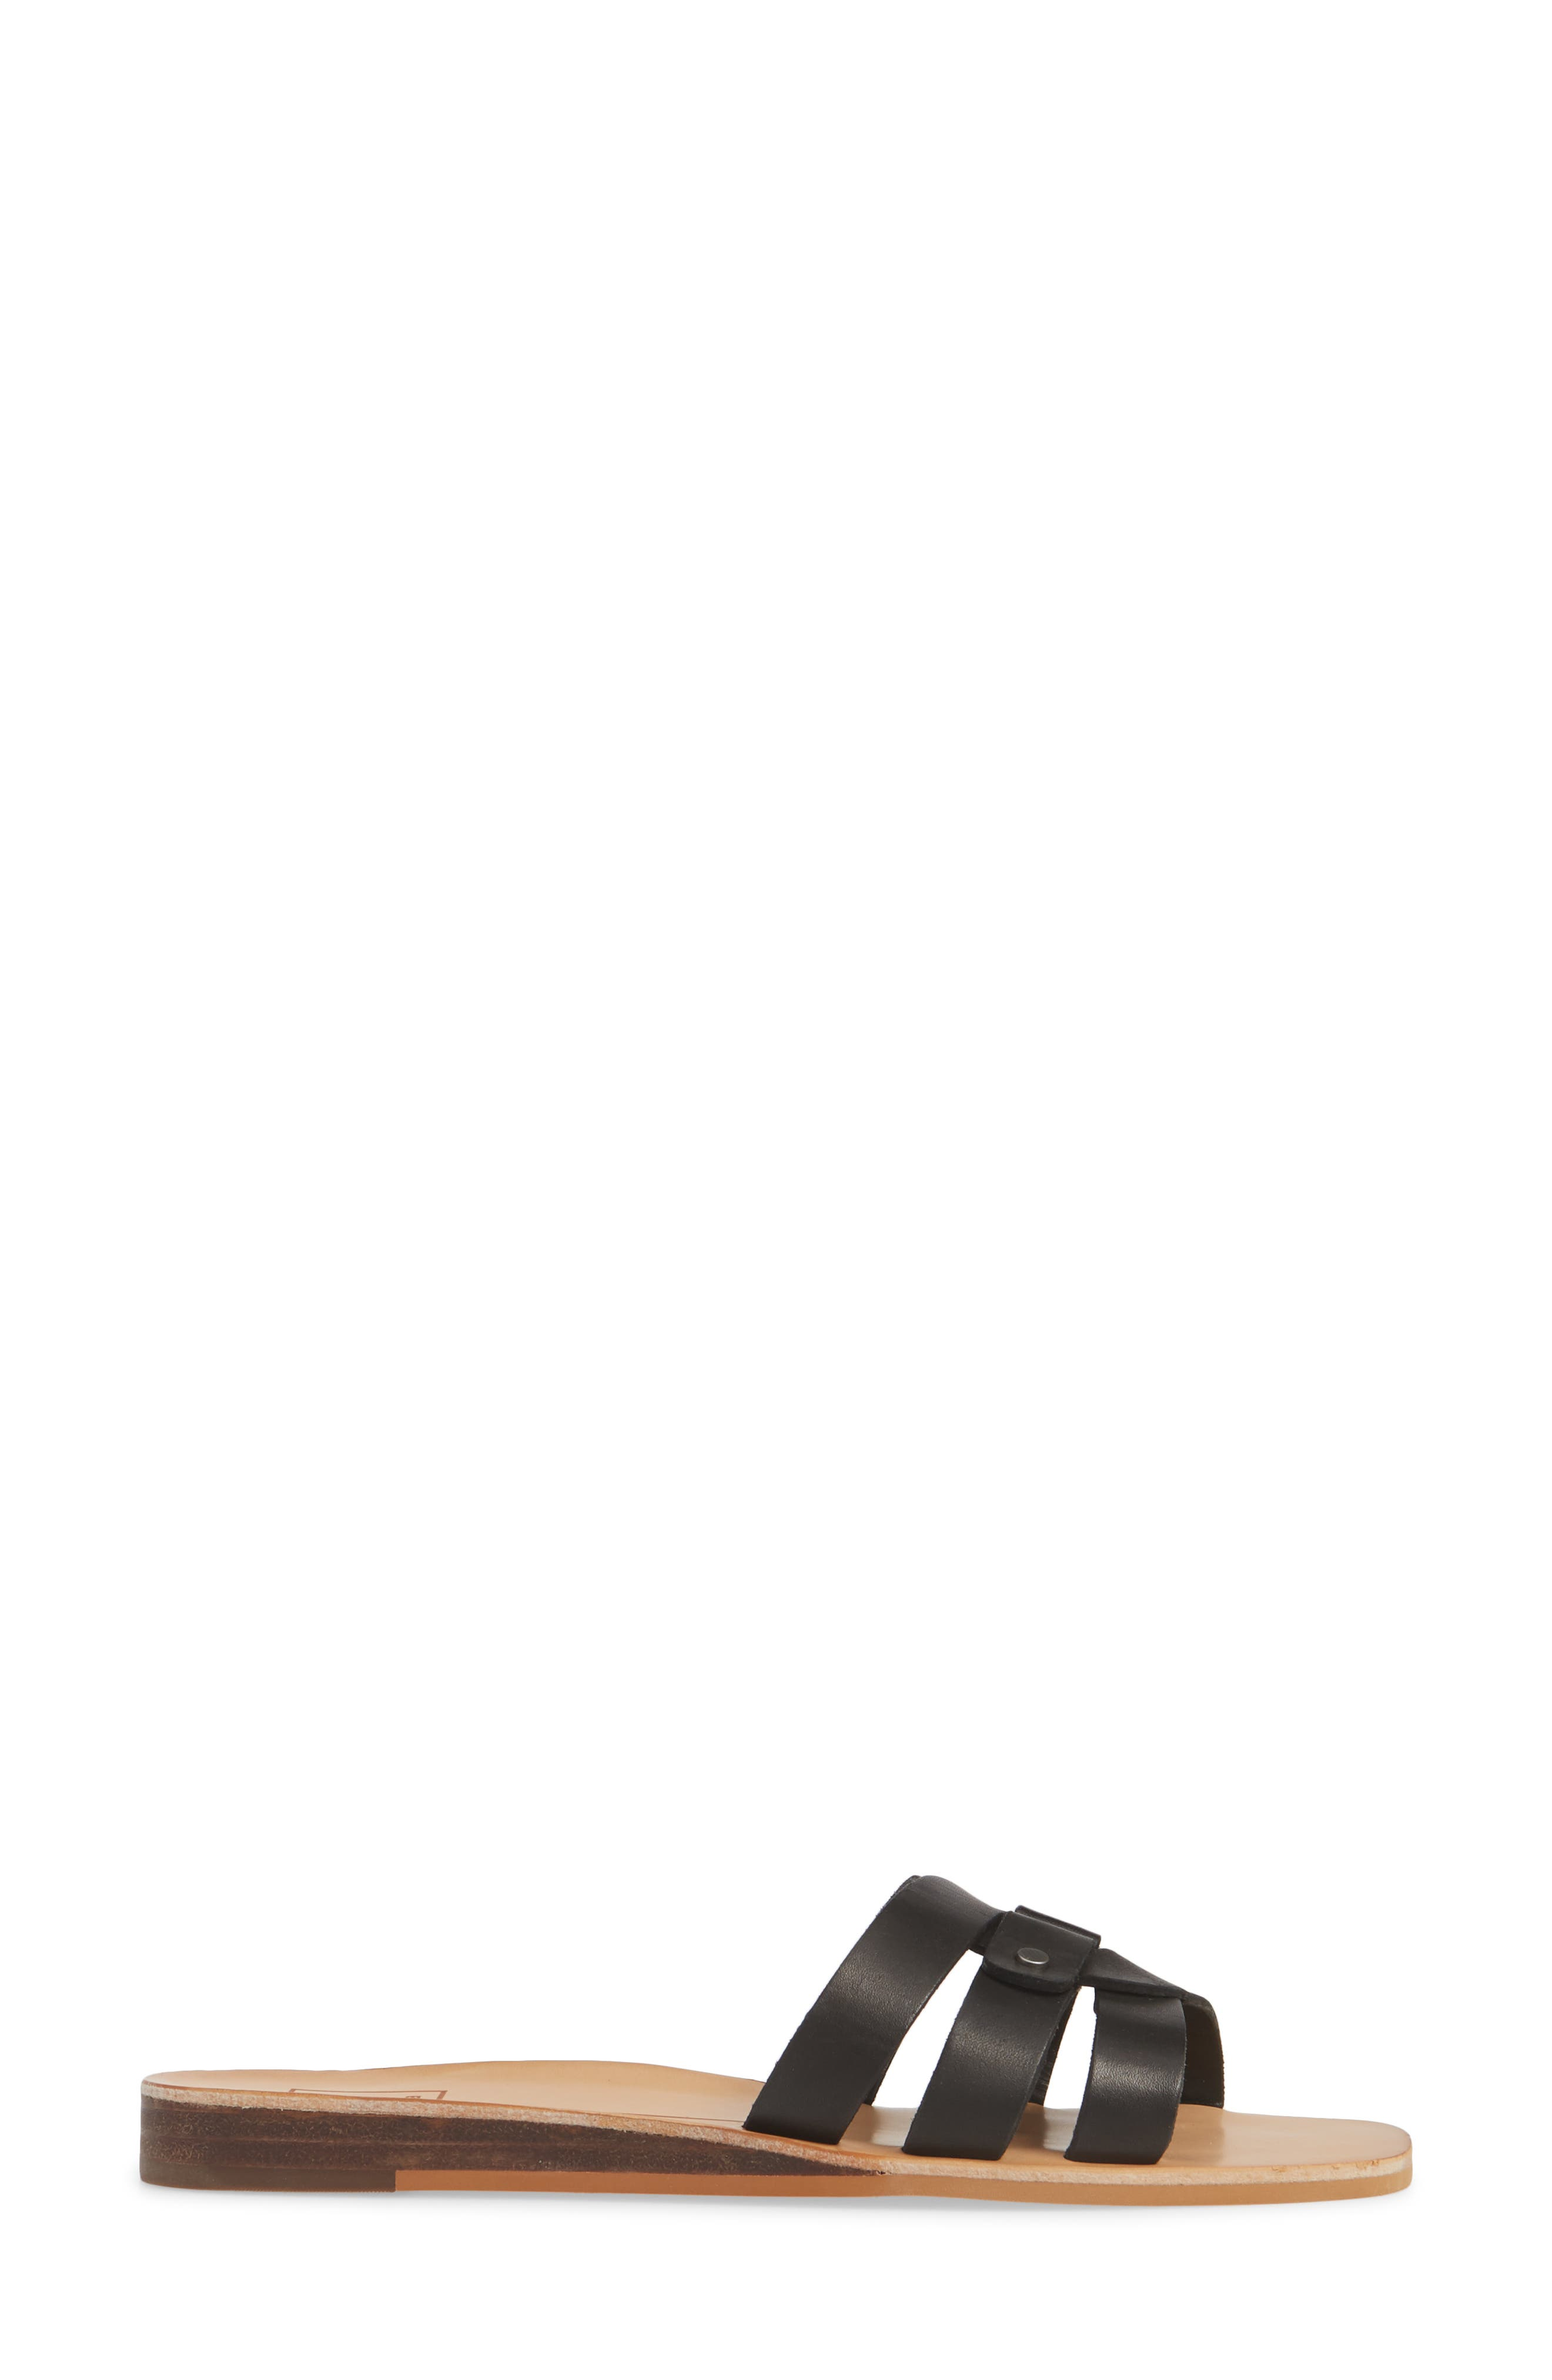 DOLCE VITA, Cait Slide Sandal, Alternate thumbnail 3, color, BLACK LEATHER